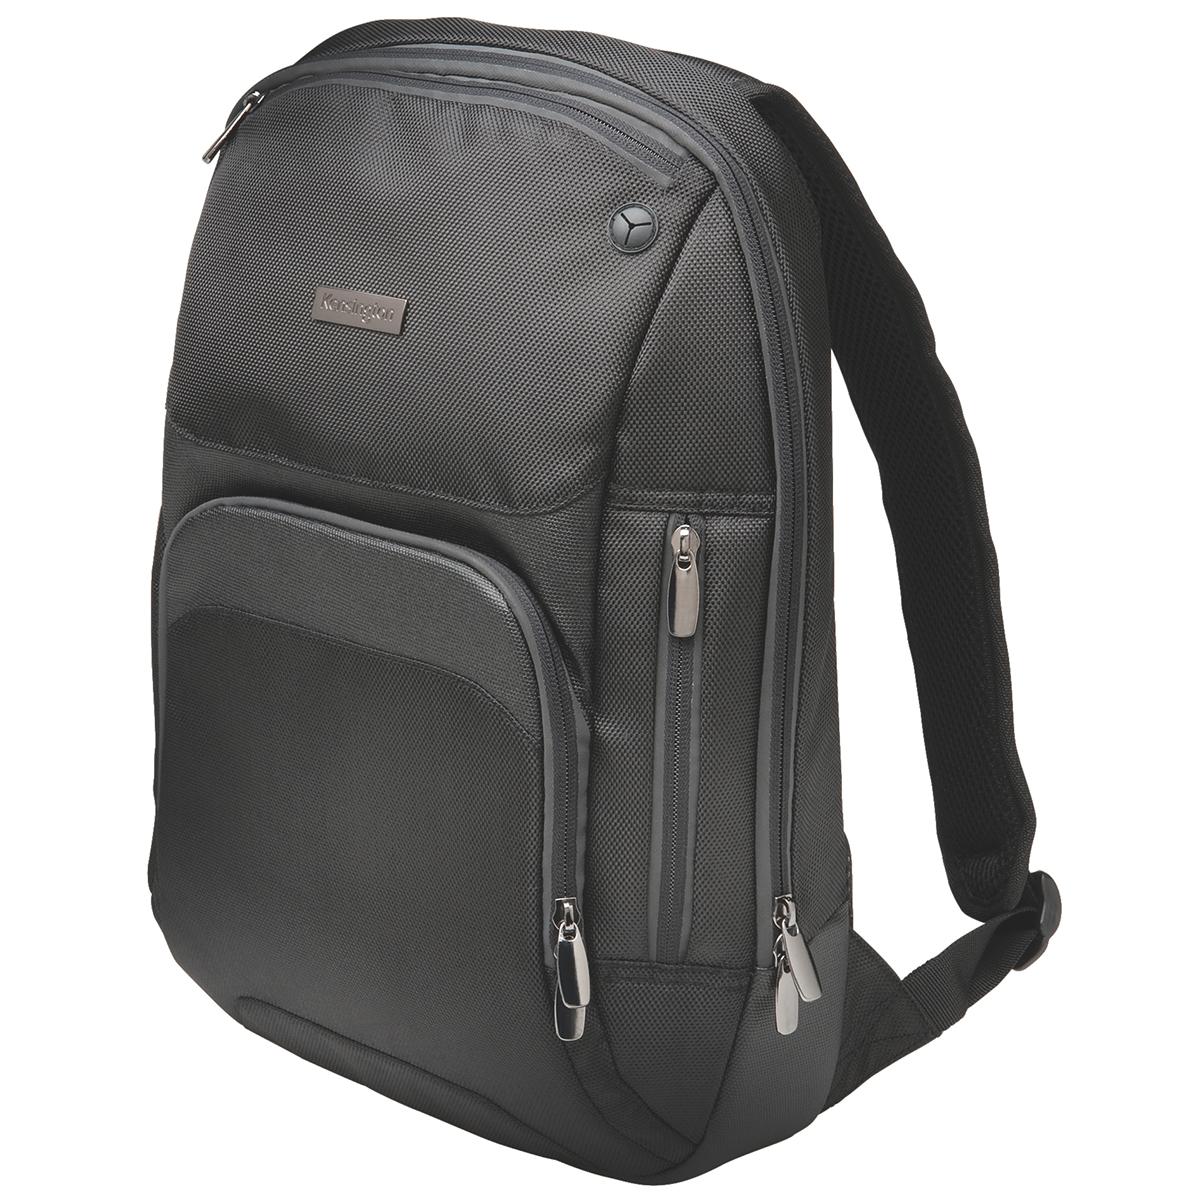 Kensington K62591EU Triple Trek 14 Inch Ultrabook Backpack